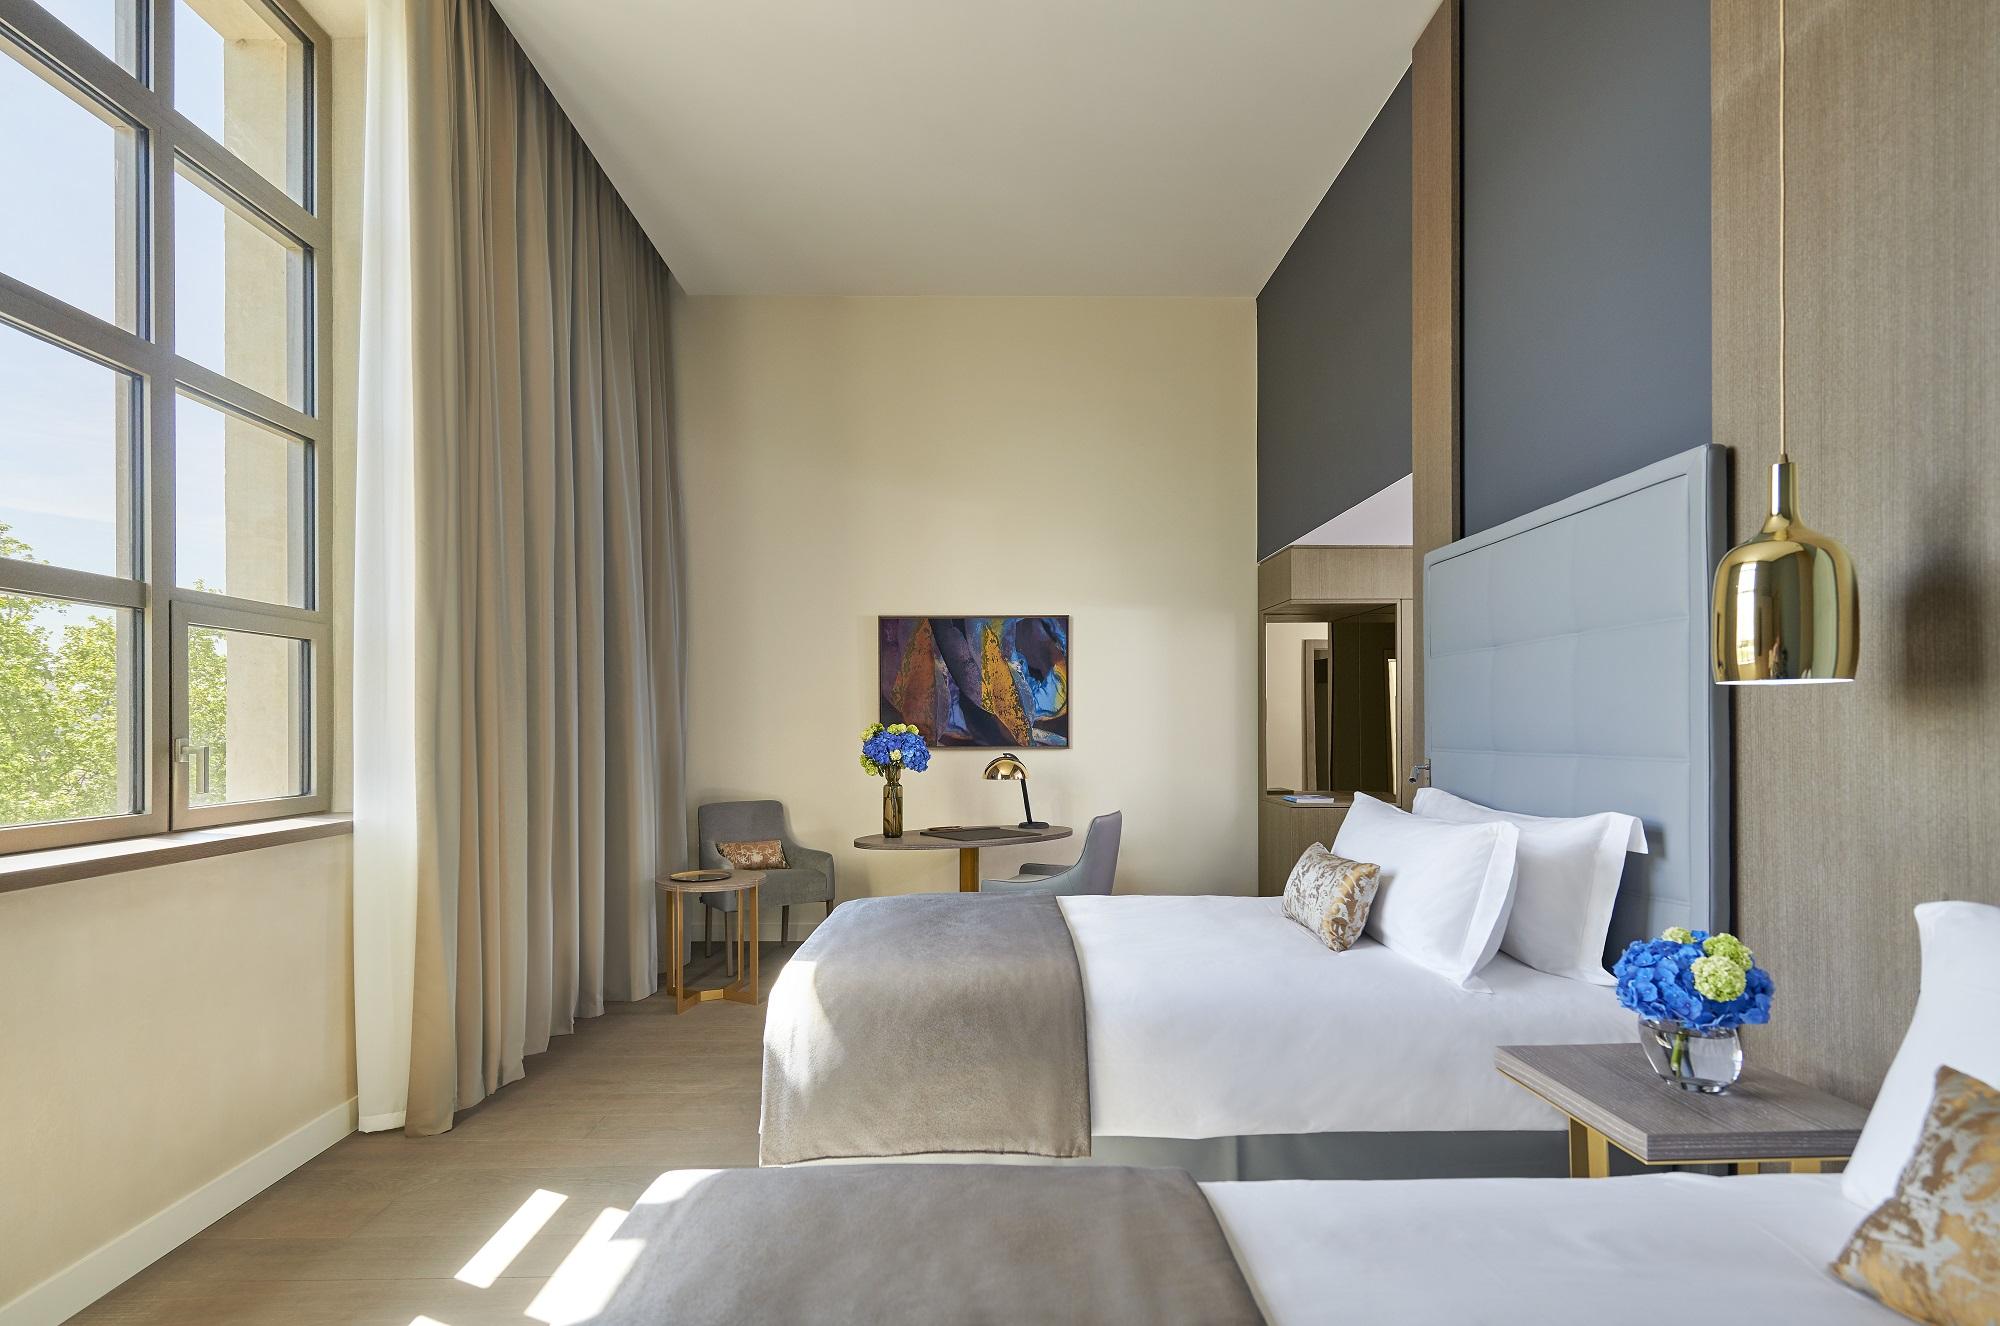 InterContinental Lyon - Hotel Dieu_Executive Room River View (c) Eric Cuvillier (3)